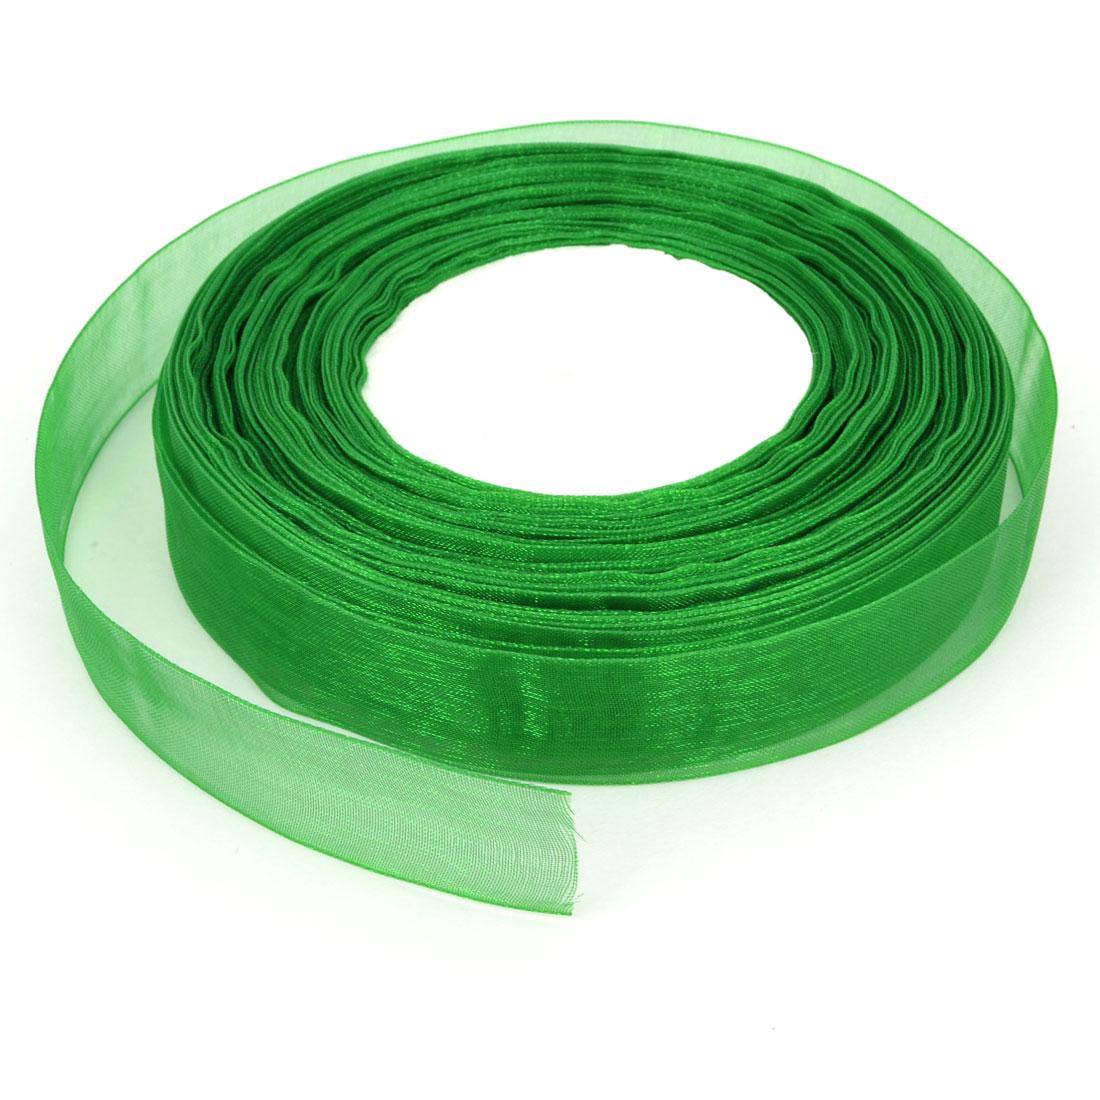 Gift Wrapping DIY Craft Festival Bridal Decoration 50 yard 20mm Emerald Green Sheer Organza Ribbon Roll Tape